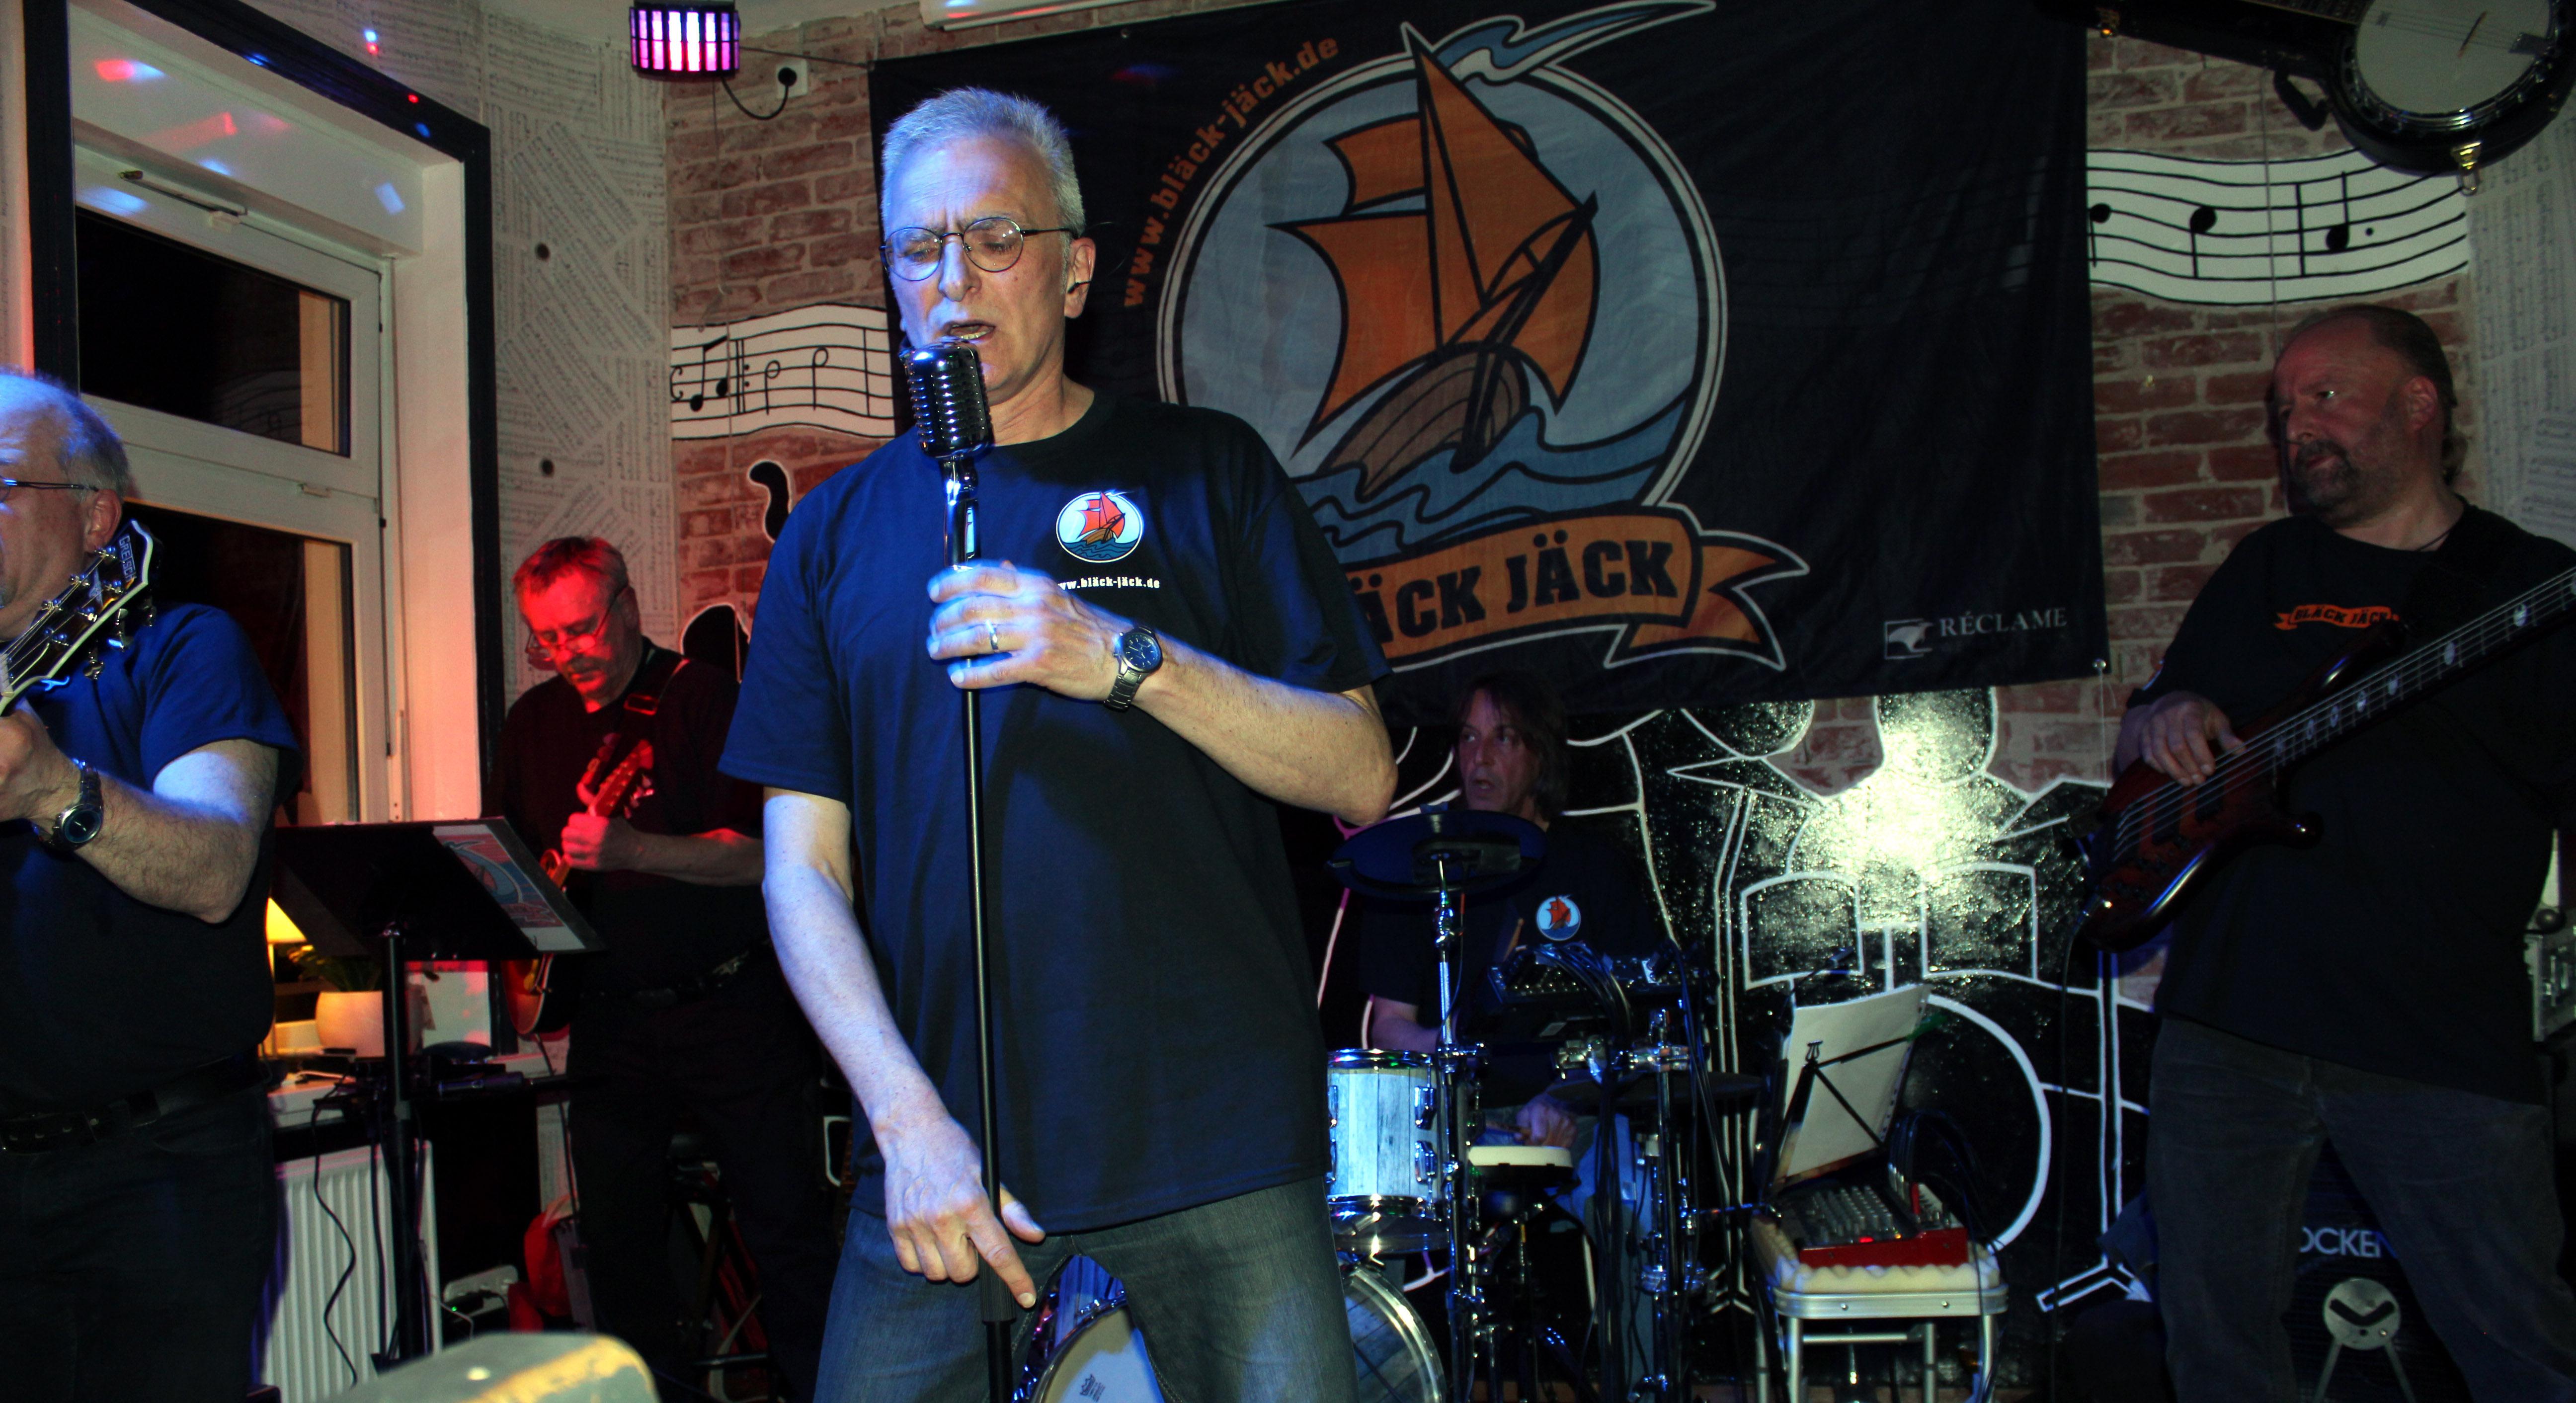 Band Bläck Jäck aus Cuxhaven